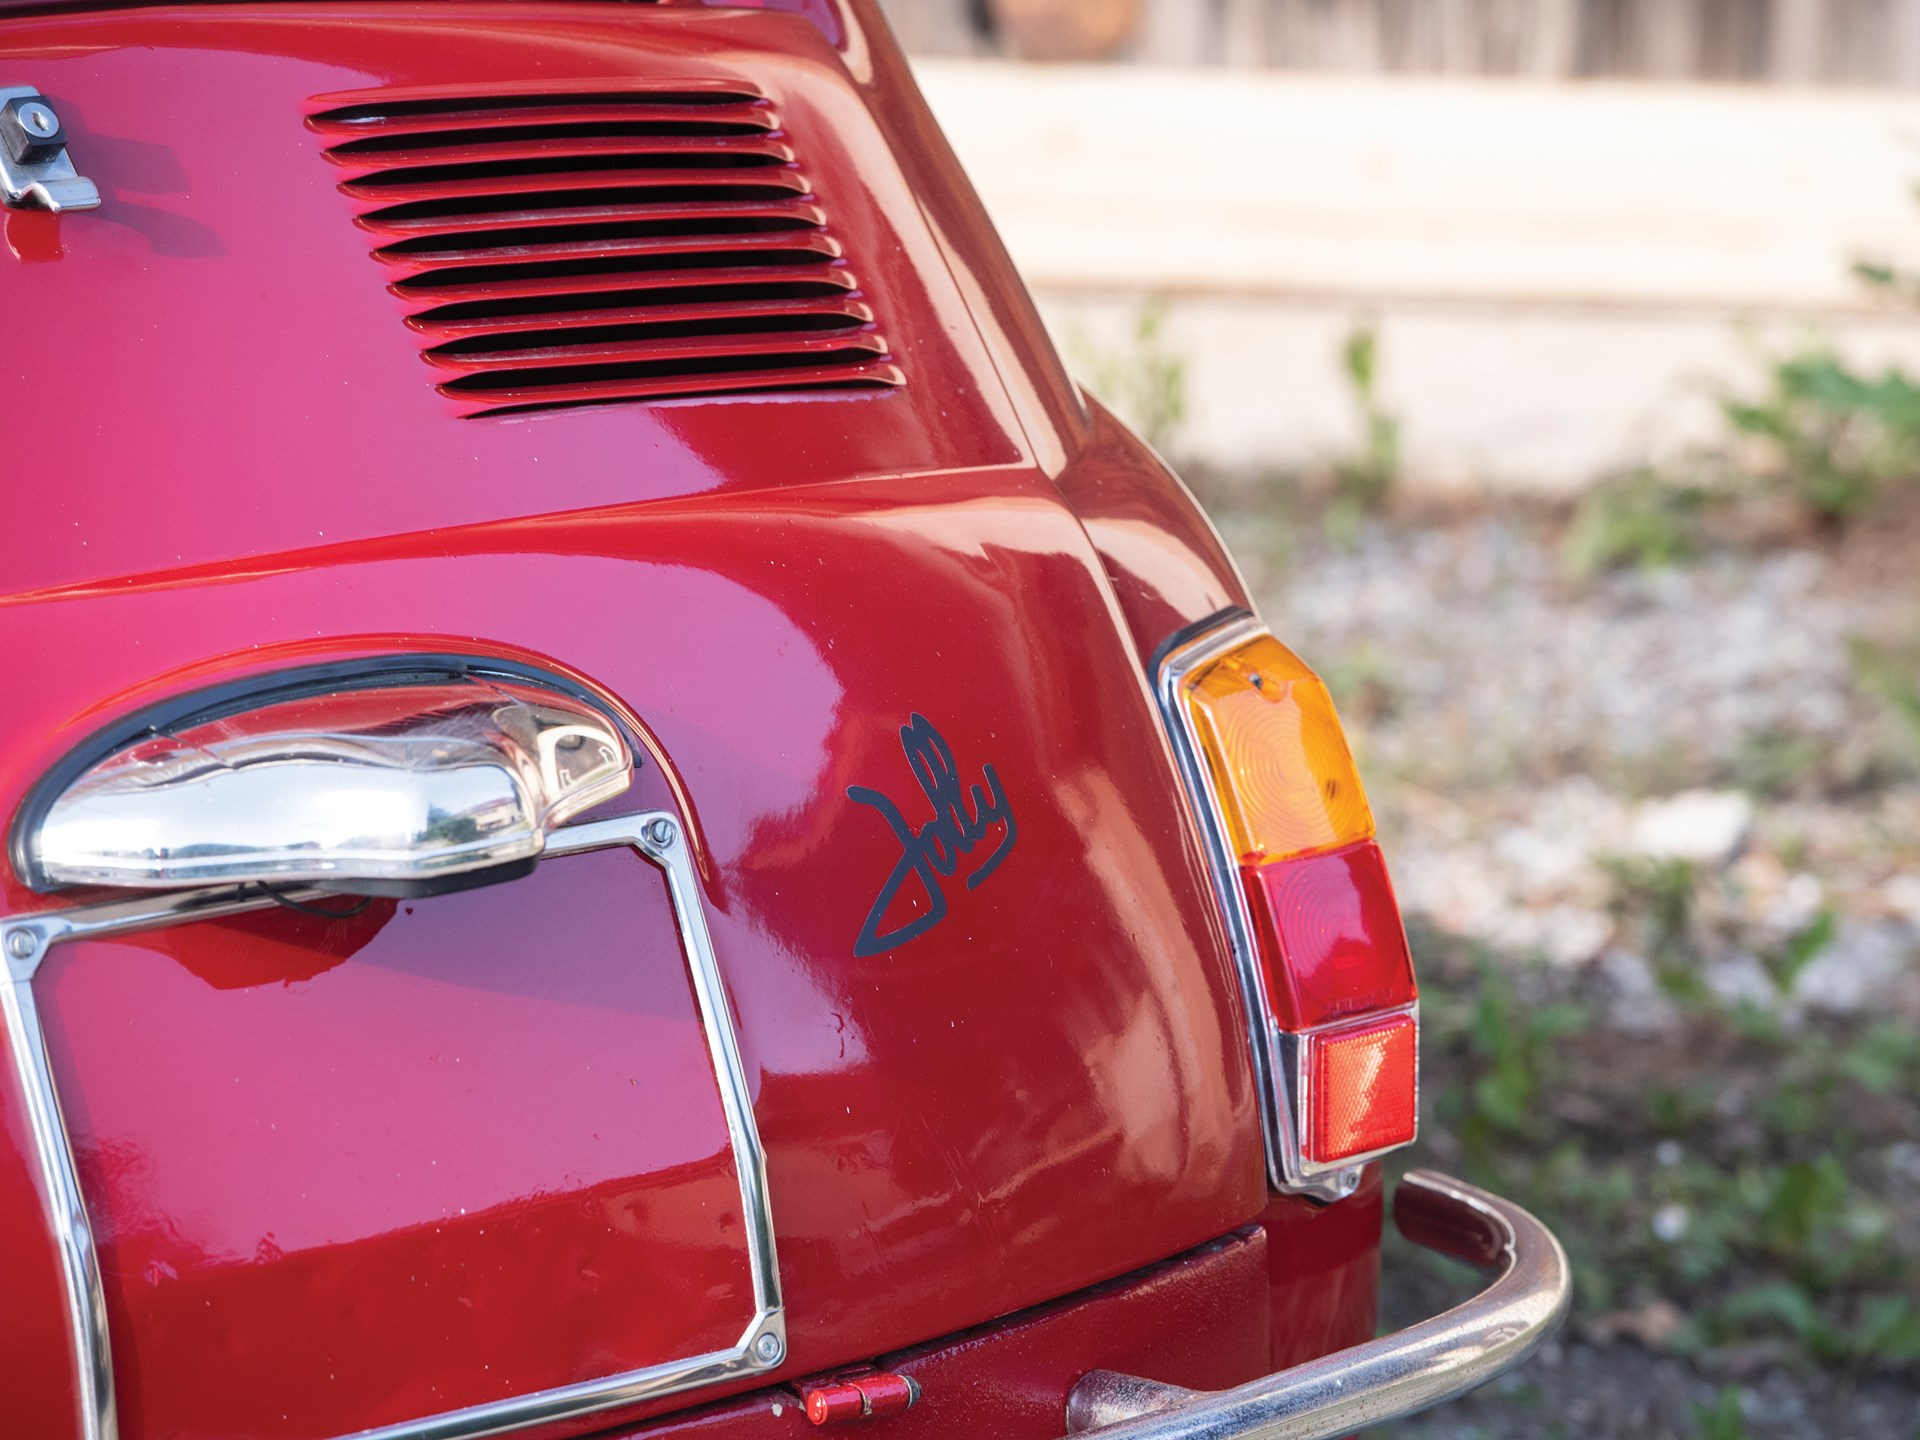 1968 Fiat Jolly rear badge